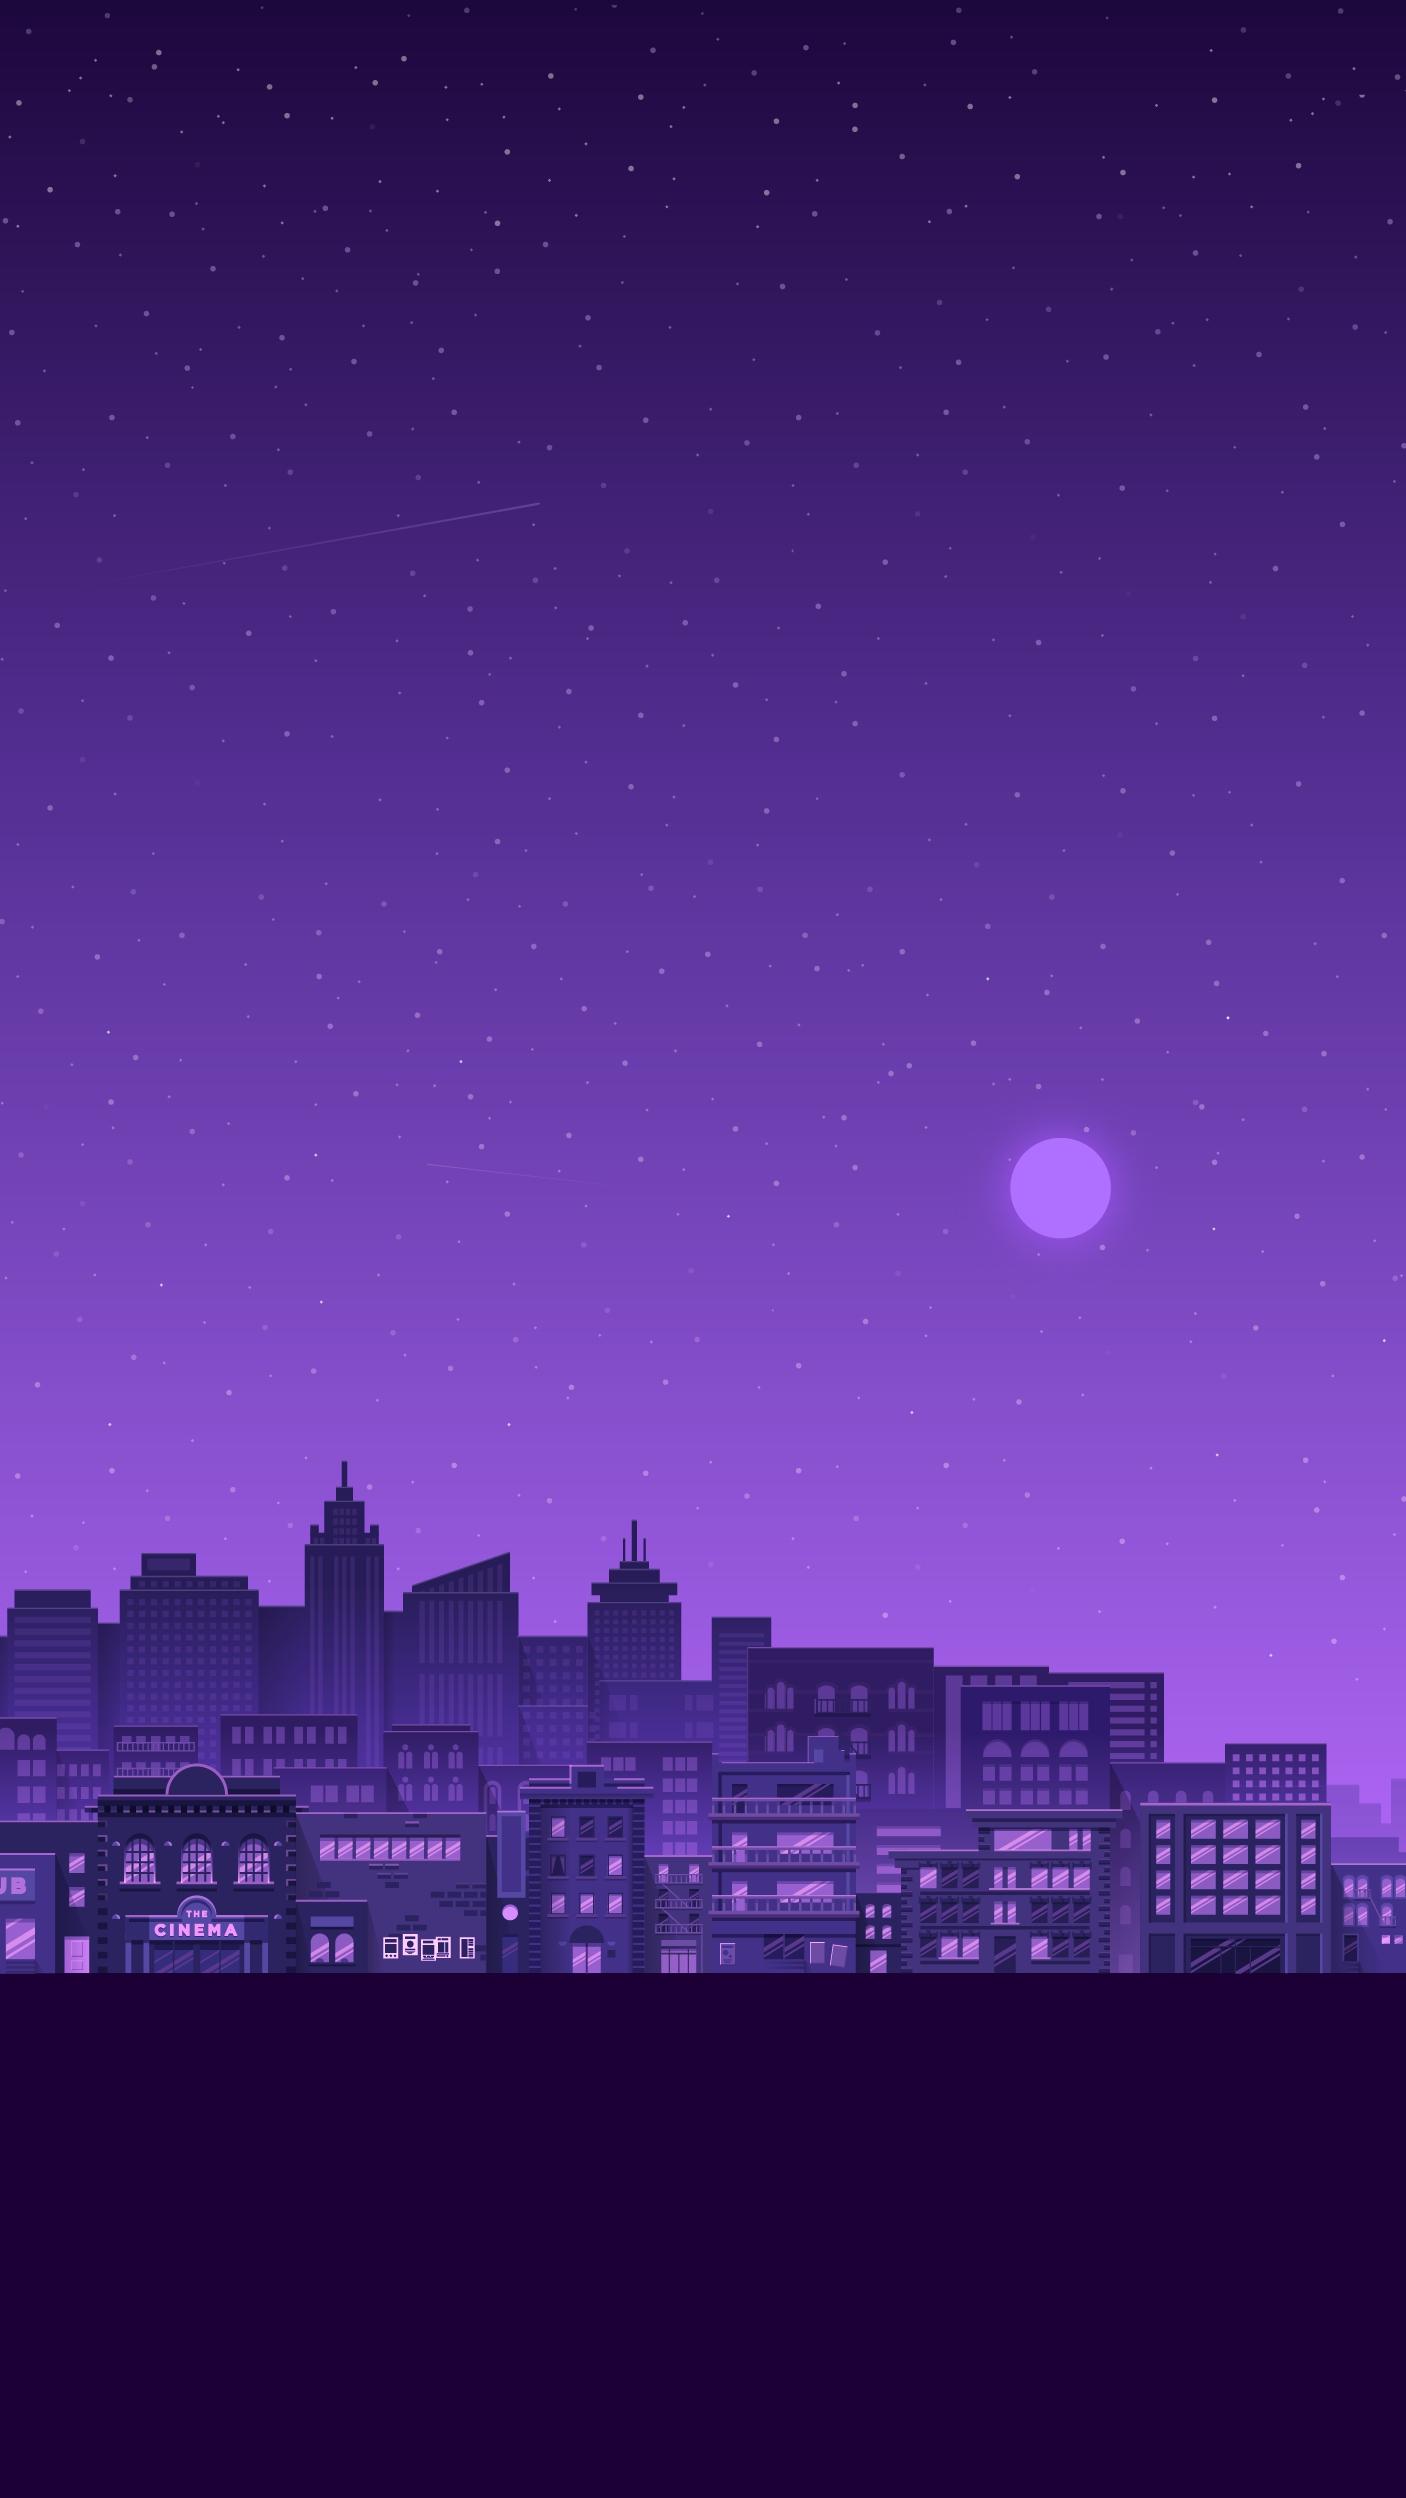 Cute Christmas Owl Desktop Wallpaper Purple City Iphone Wallpaper Iphone Wallpapers